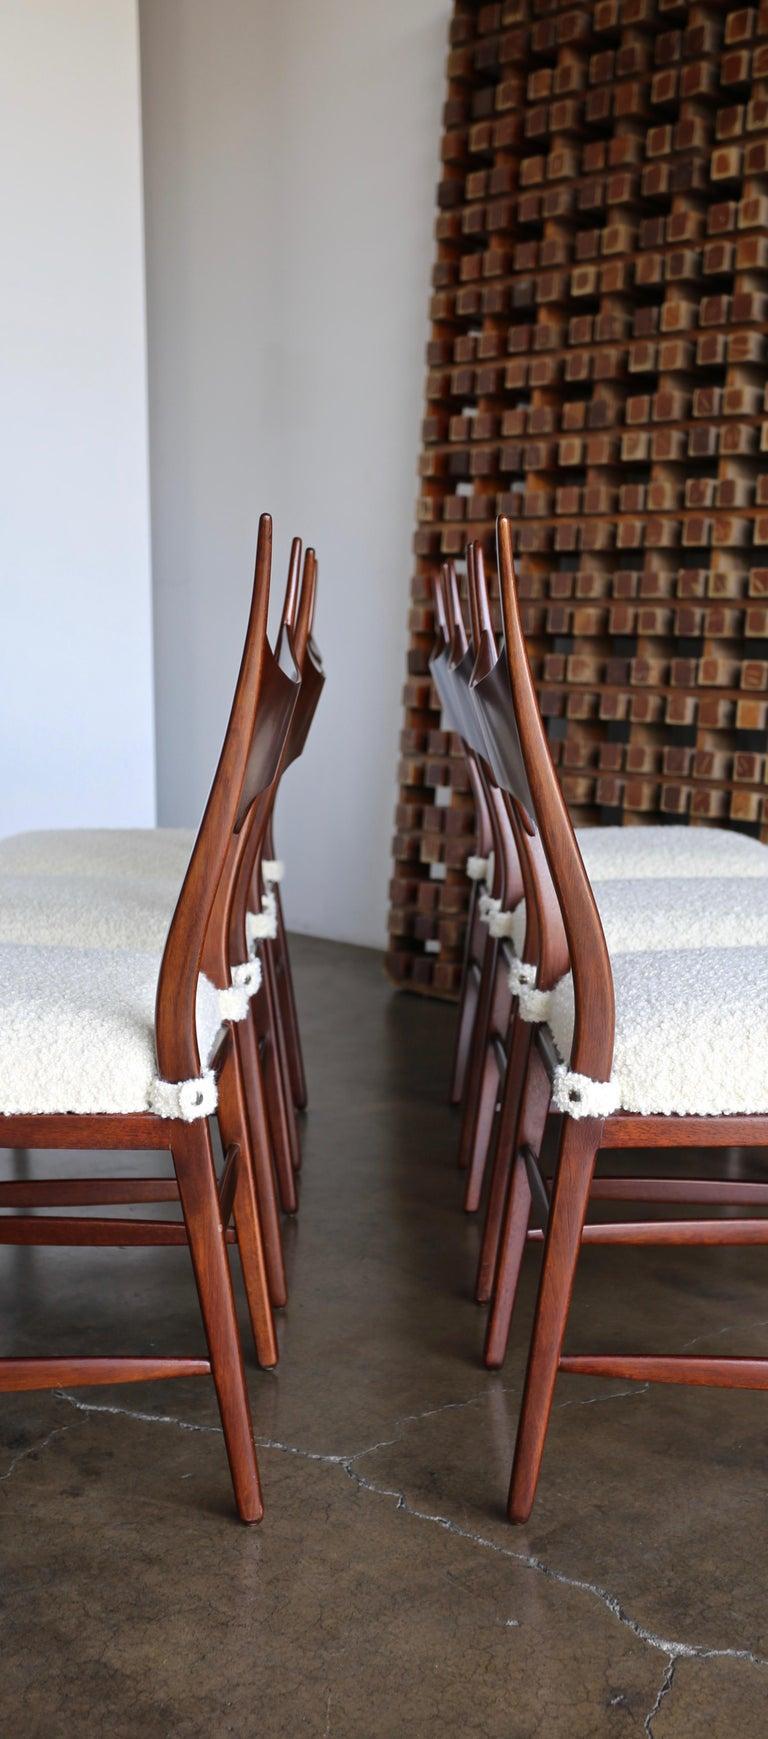 Bouclé Edward Wormley 5580 Dining Chairs for Dunbar, 1950s For Sale